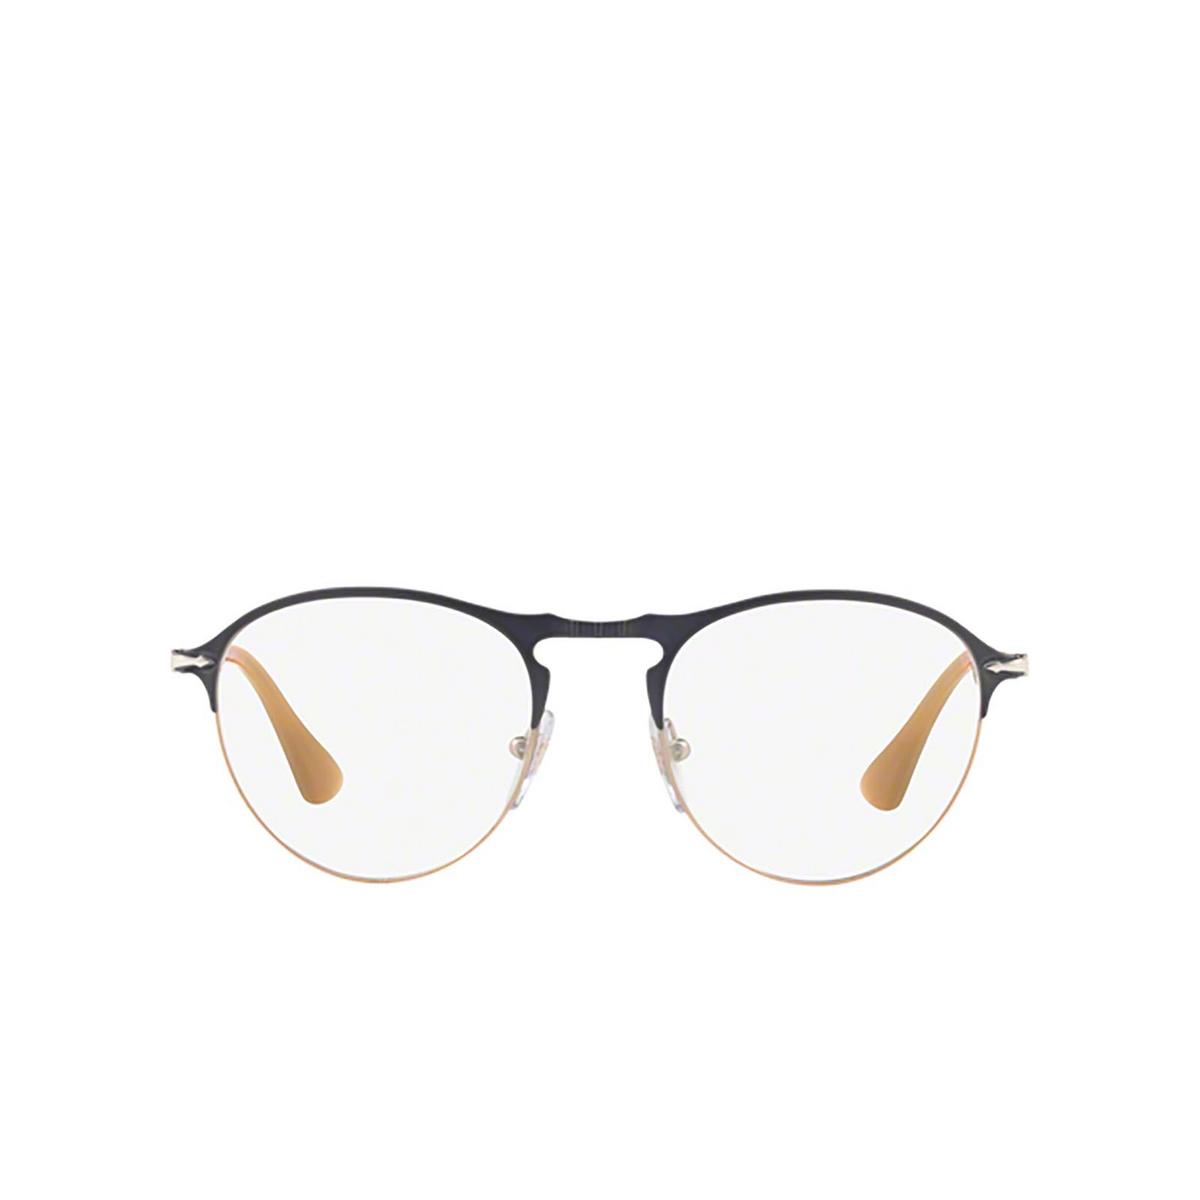 Persol® Round Eyeglasses: PO7092V color Matte Grey / Light Brown 1071 - front view.